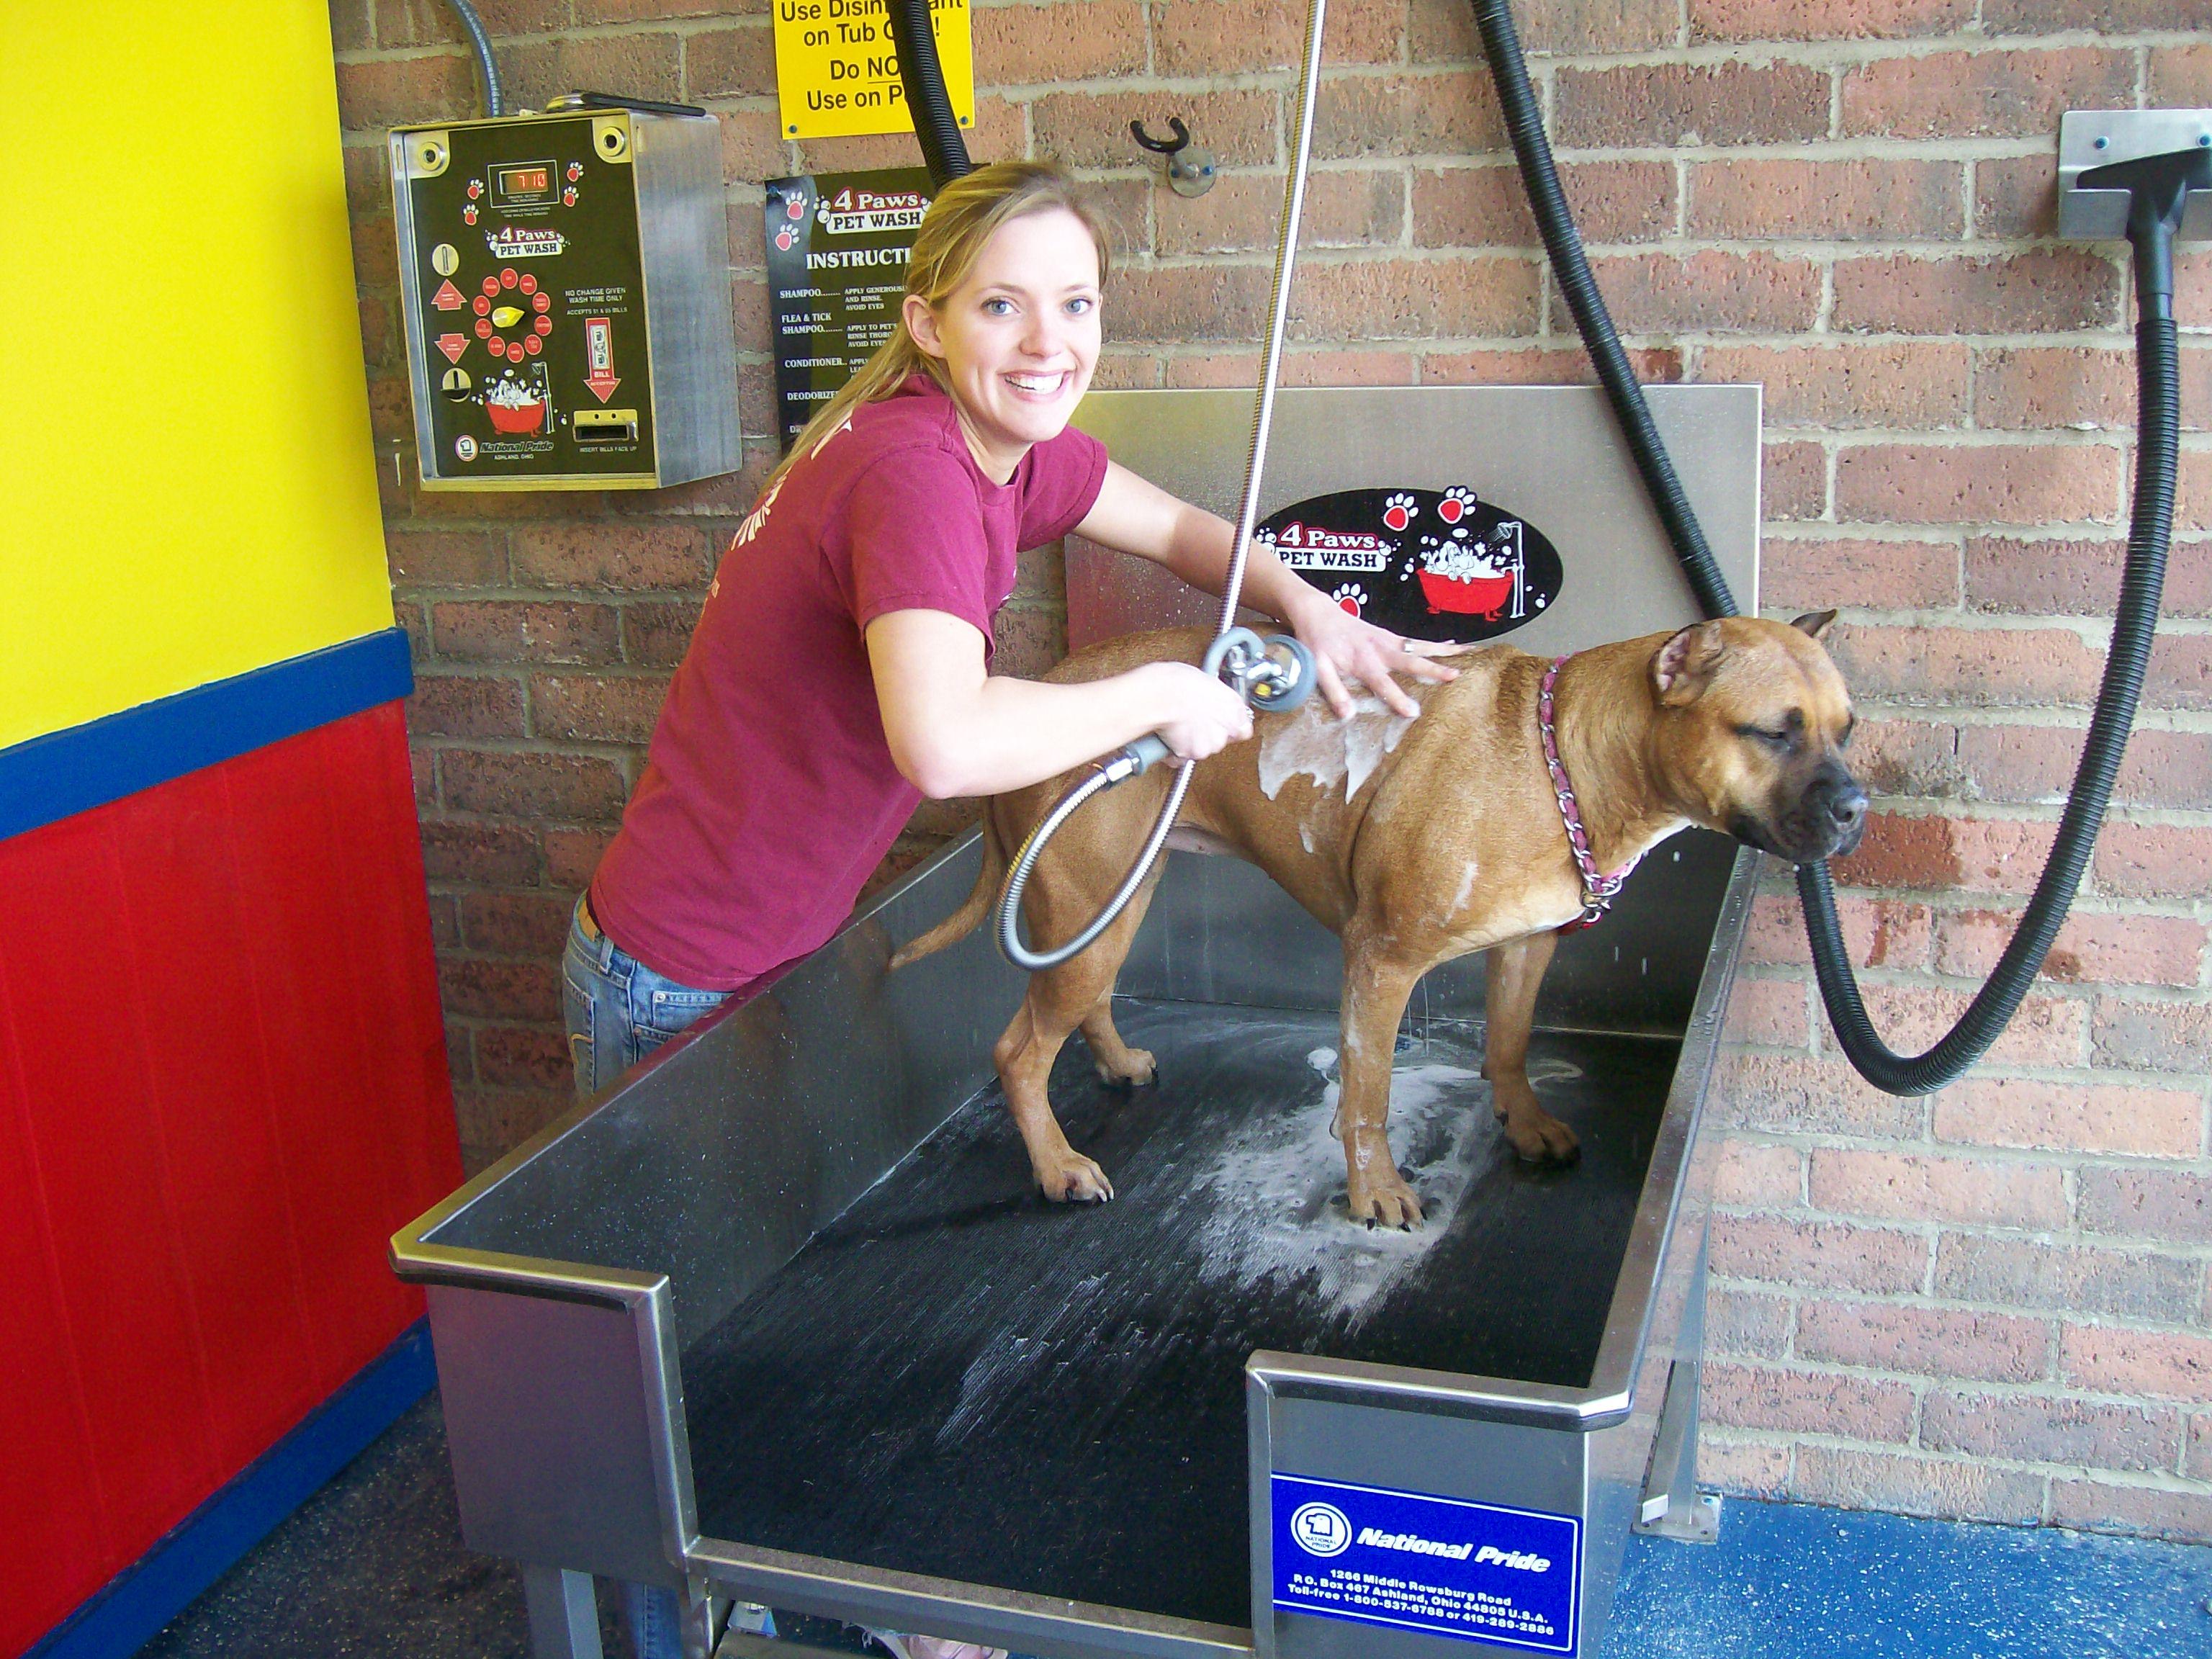 Selling My Dog Wash Equipment « Car Wash Business 101